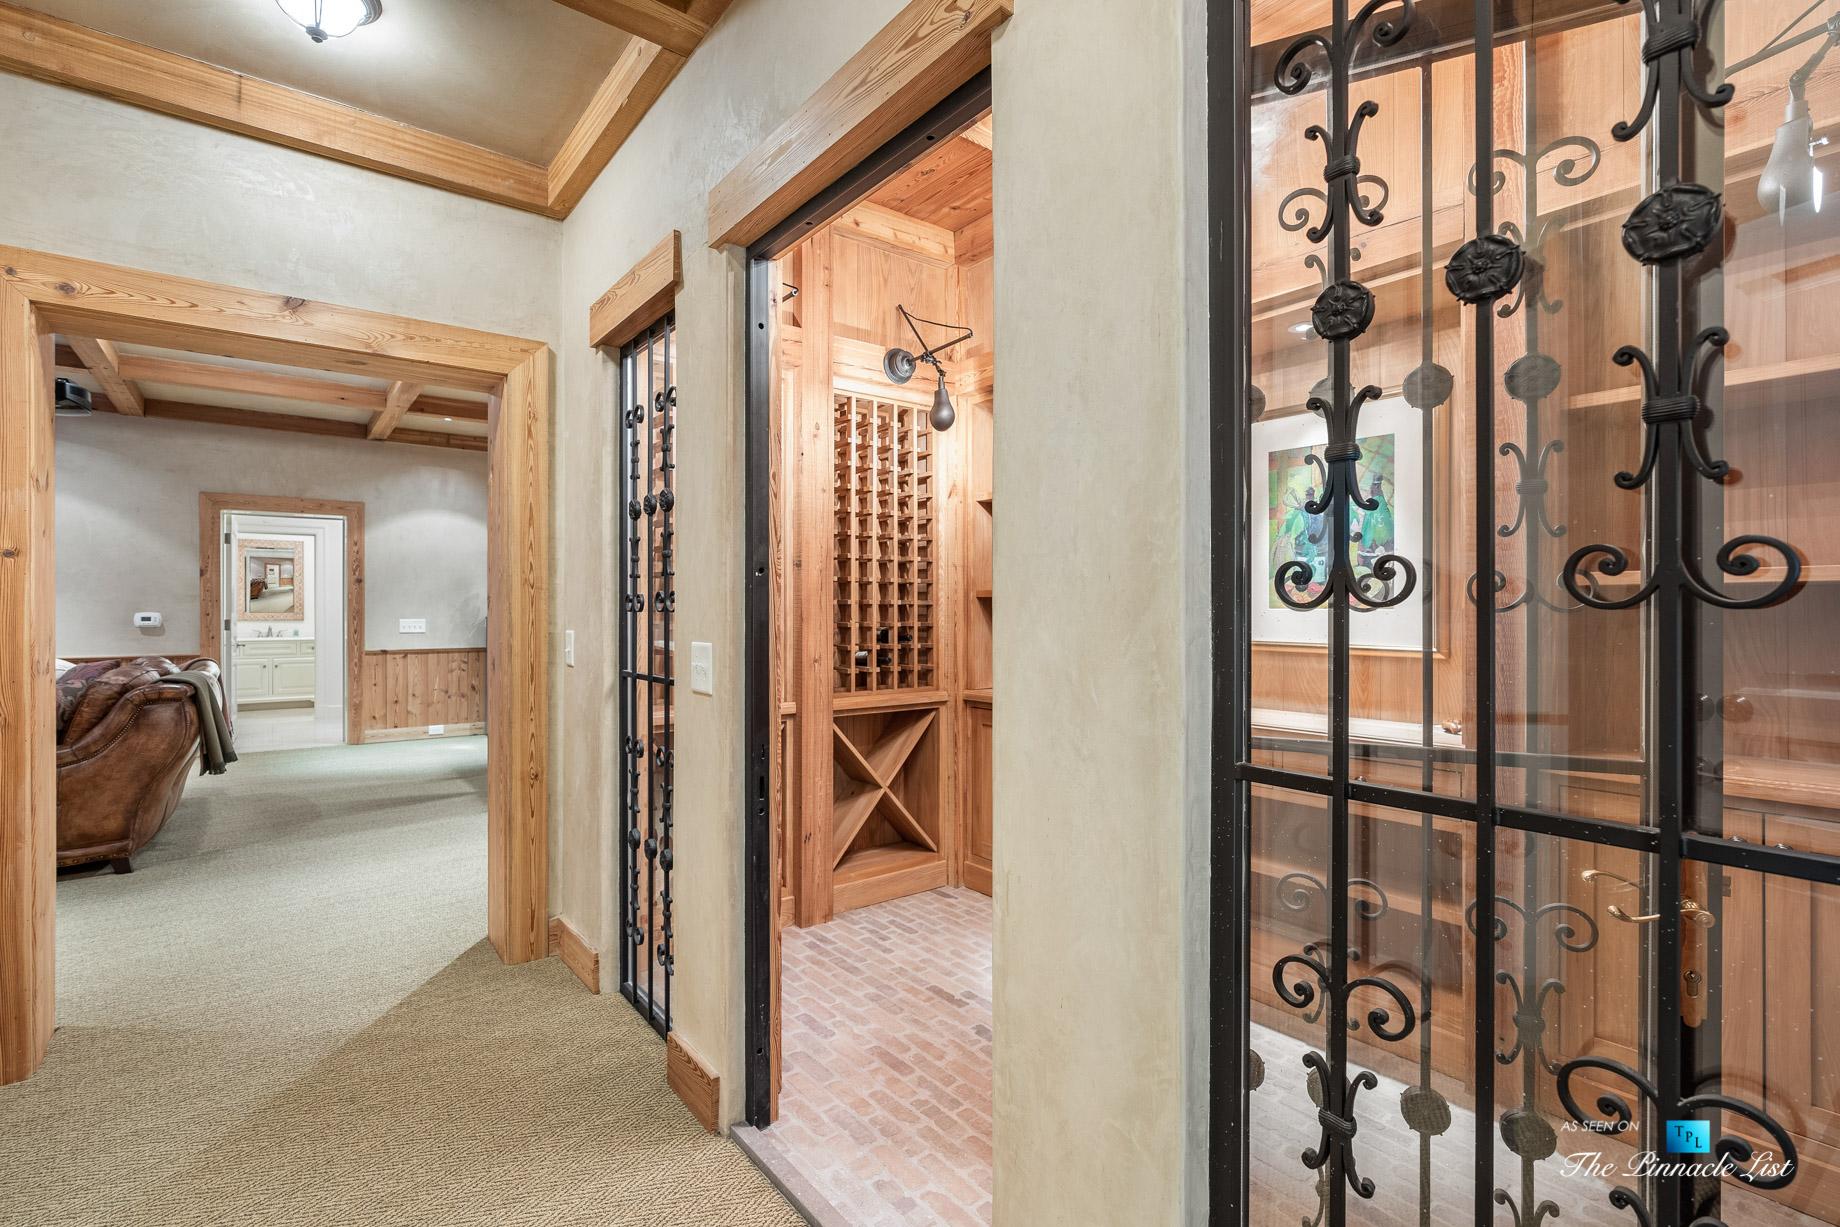 439 Blackland Rd NW, Atlanta, GA, USA – Wine Room – Luxury Real Estate – Tuxedo Park Mediterranean Mansion Home